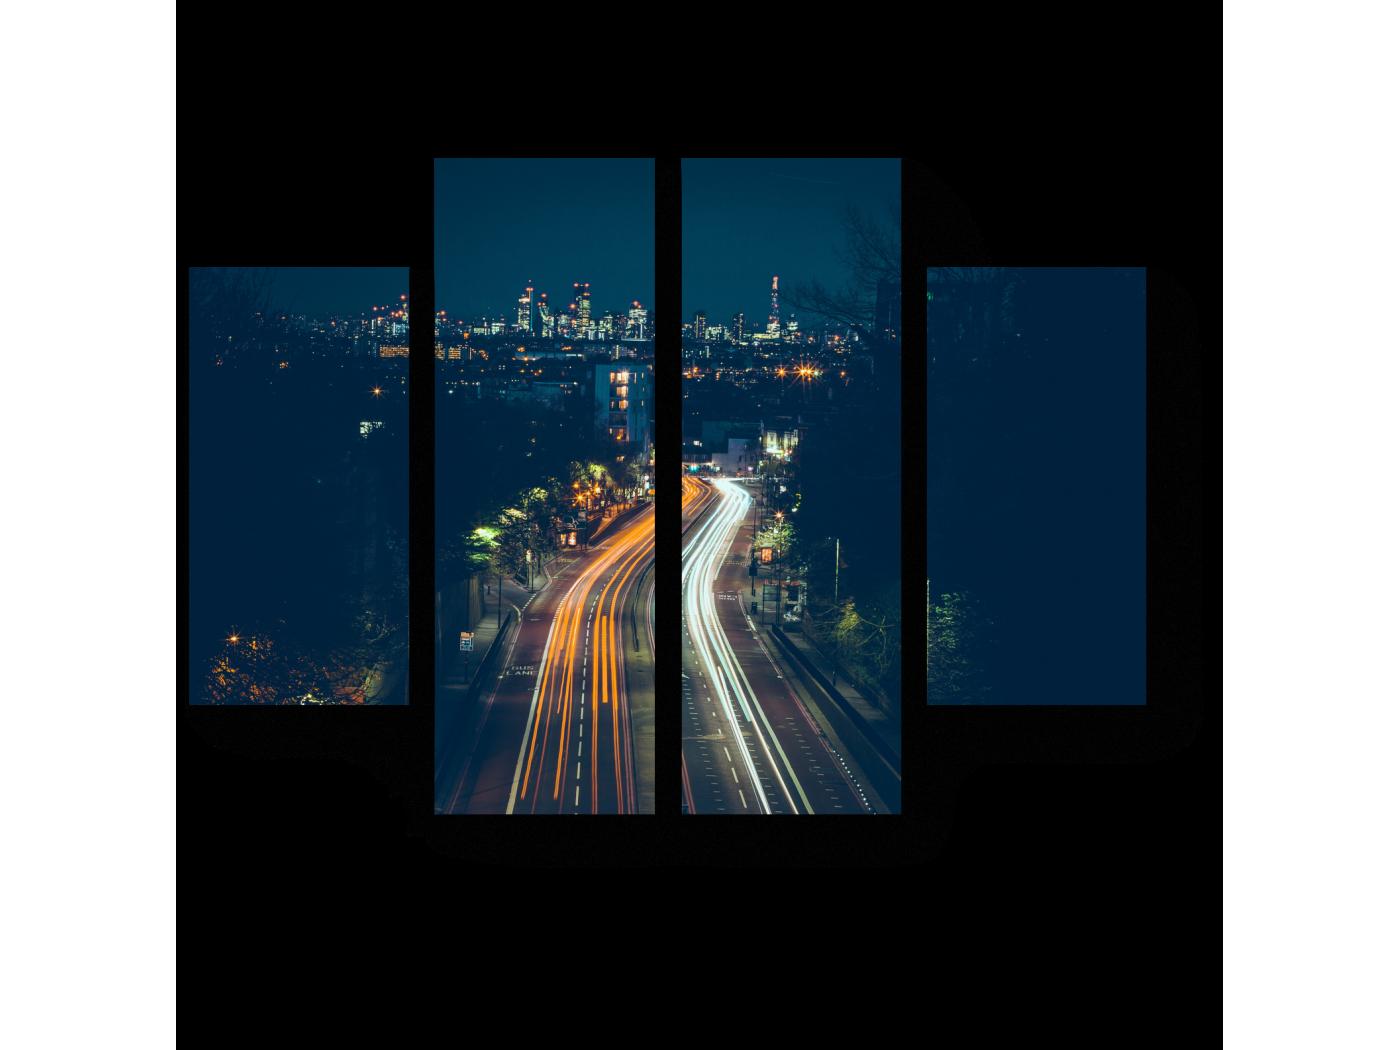 Модульная картина Пустынная дорога на окраине Лондона (80x60) фото